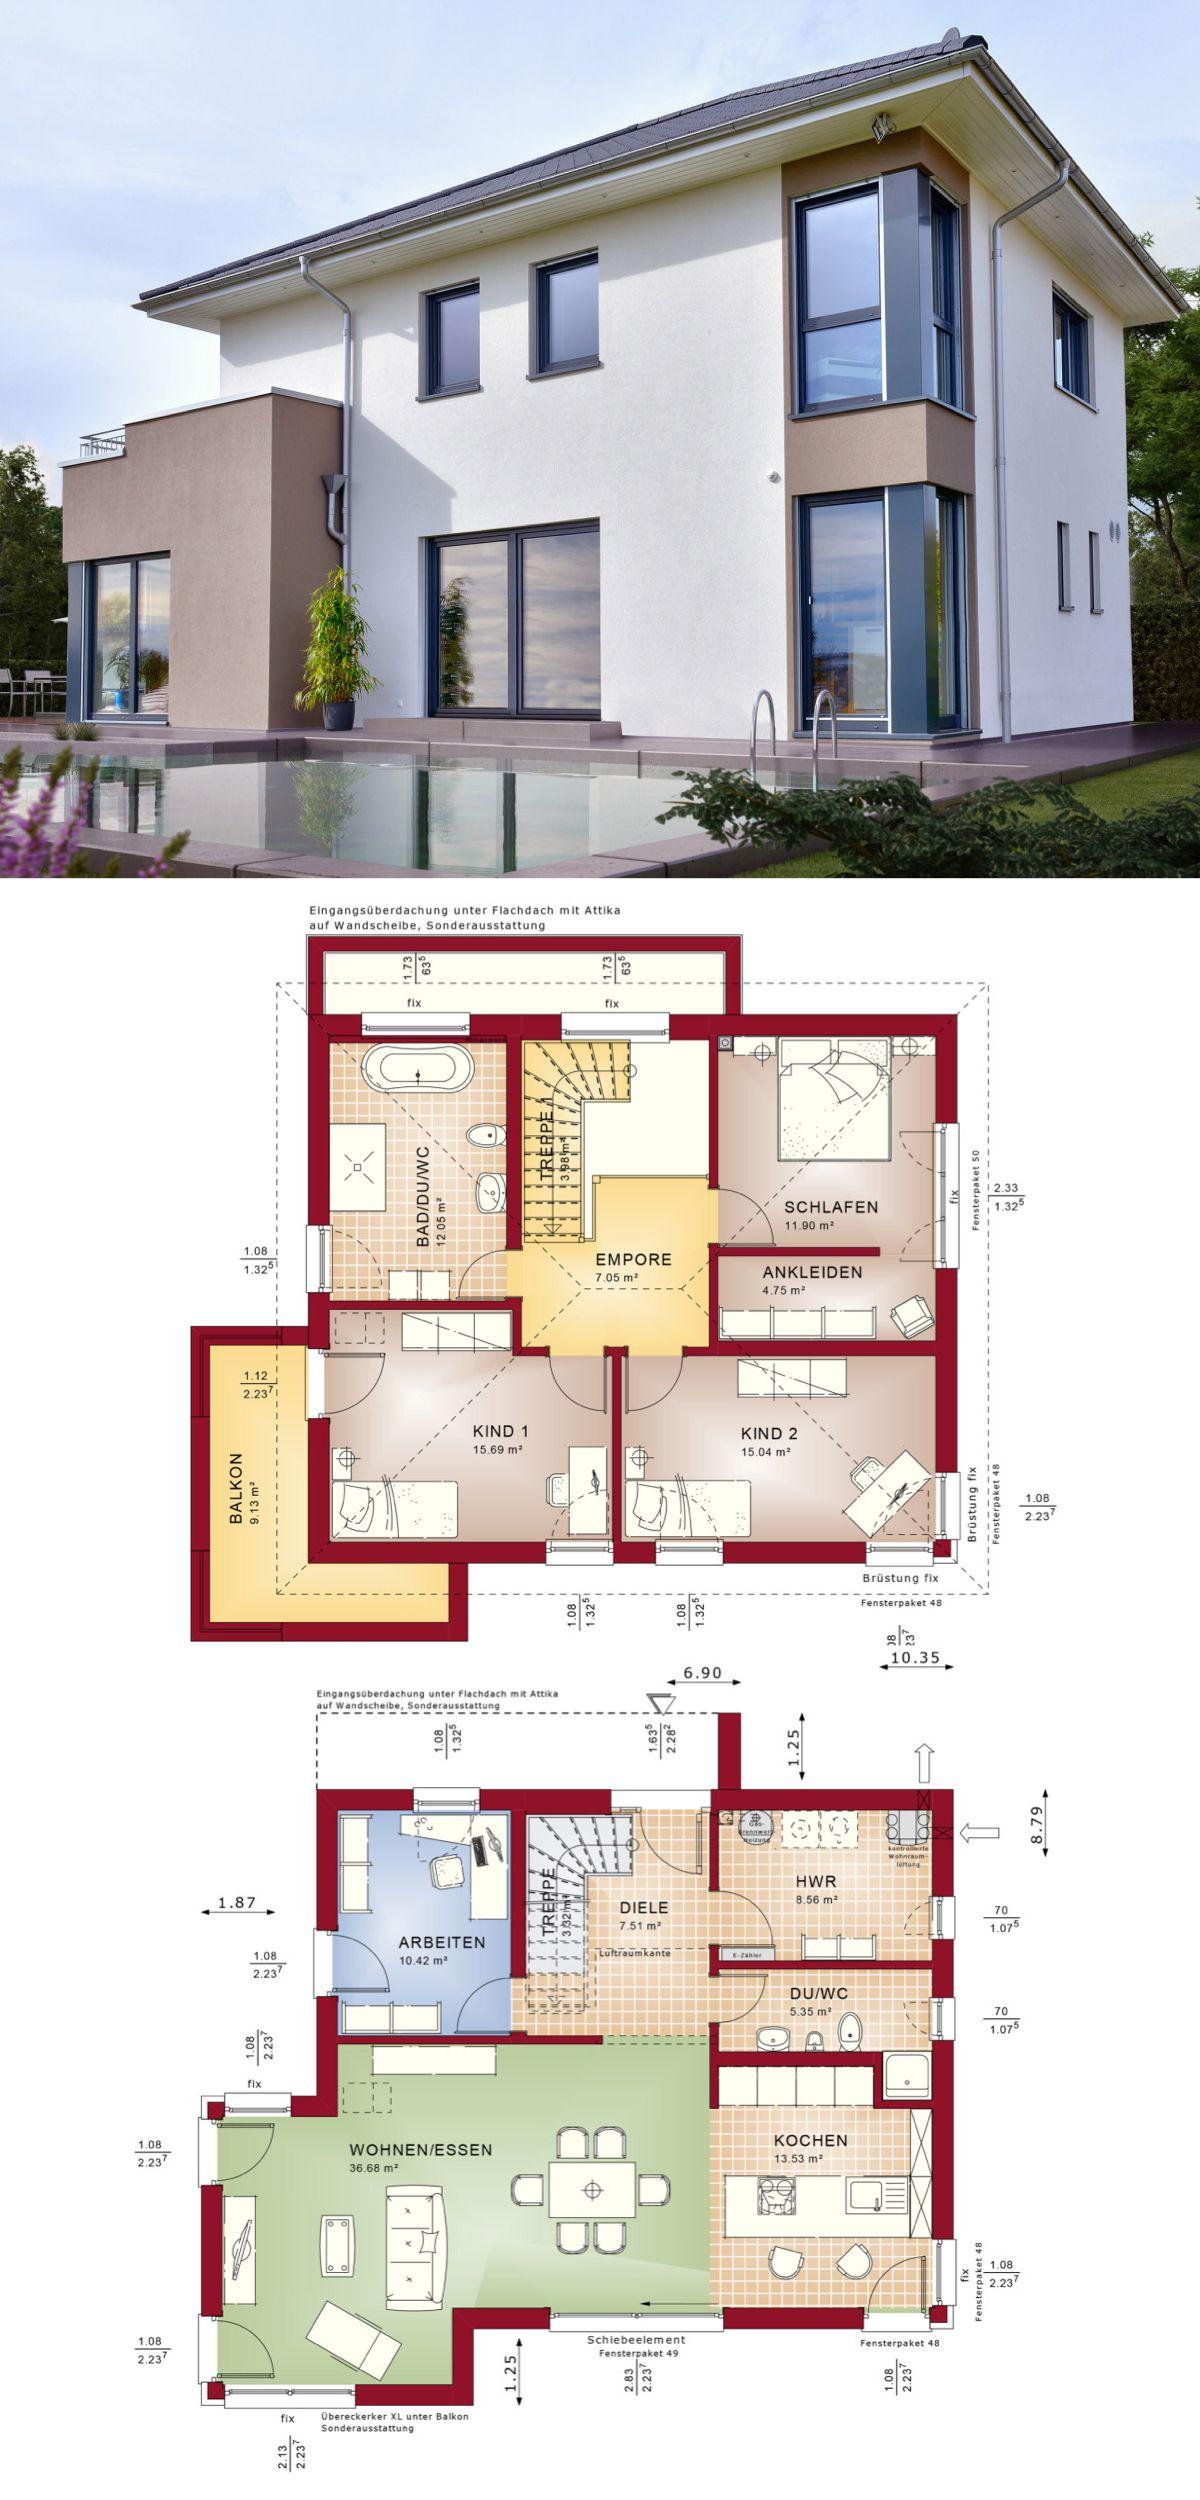 Perfekt Moderne Stadtvilla   Einfamilienhaus Concept M 145 Bien Zenker